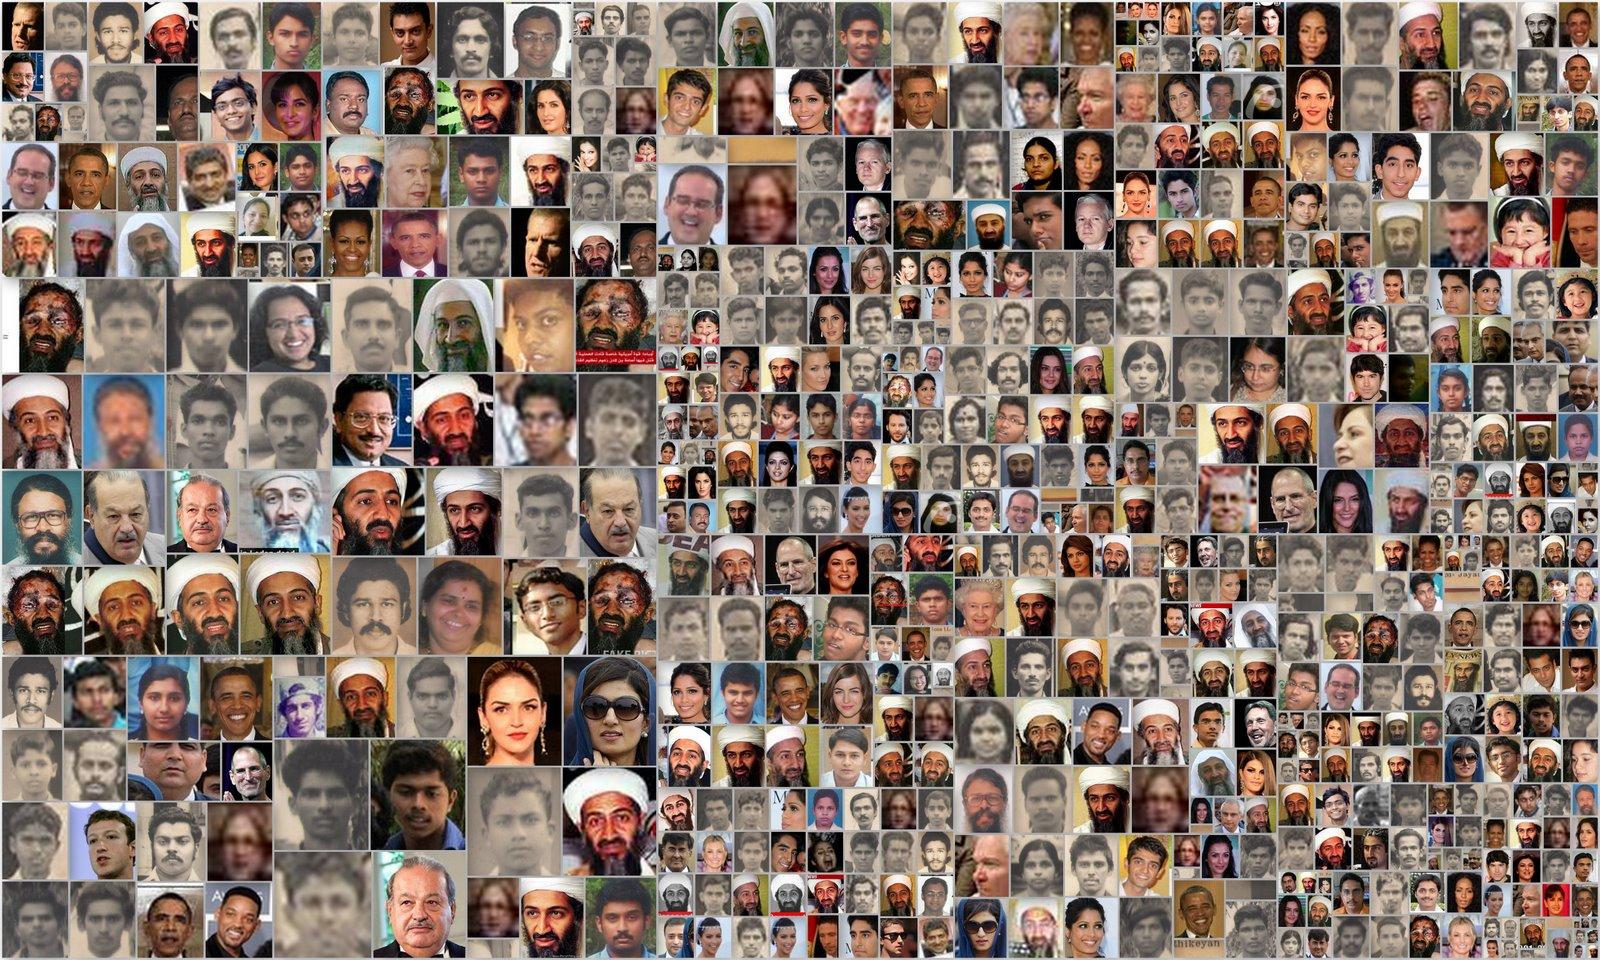 lifeofjagadishchandran: Collage of all passport size PHOTOS